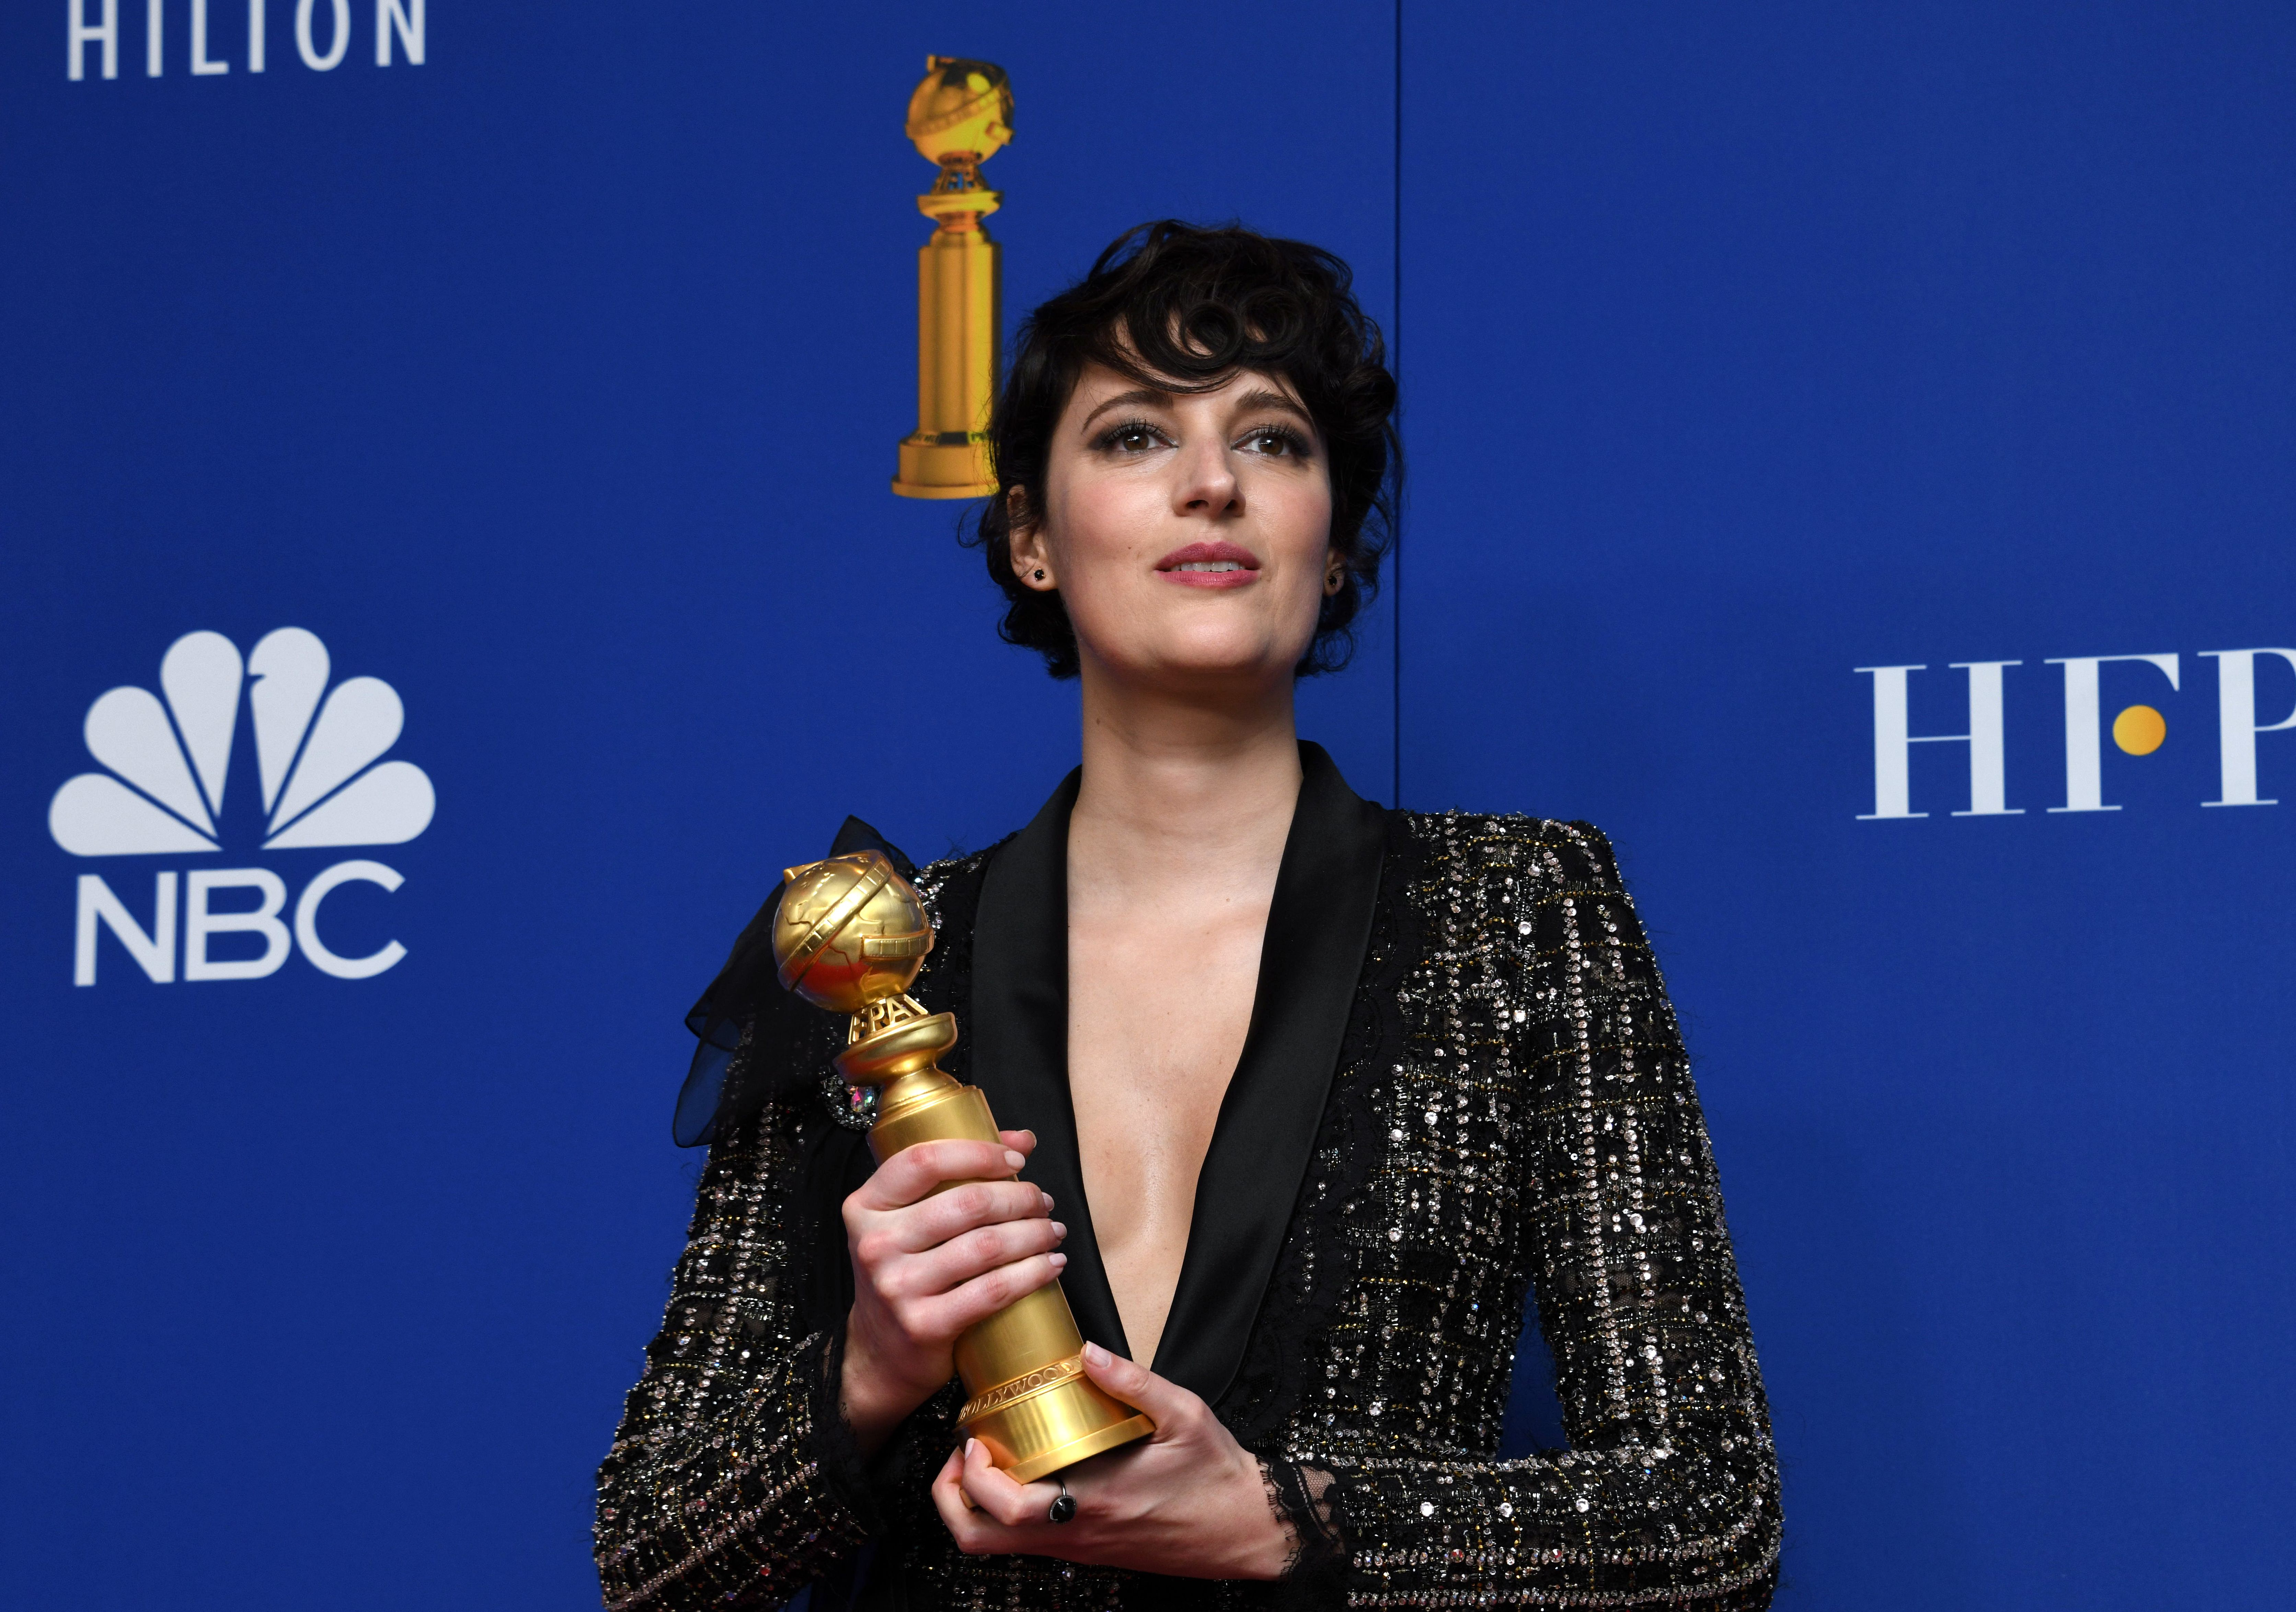 Phoebe Waller-Bridge to Auction off Golden Globes Suit, Donate Proceeds to Relief in Australia